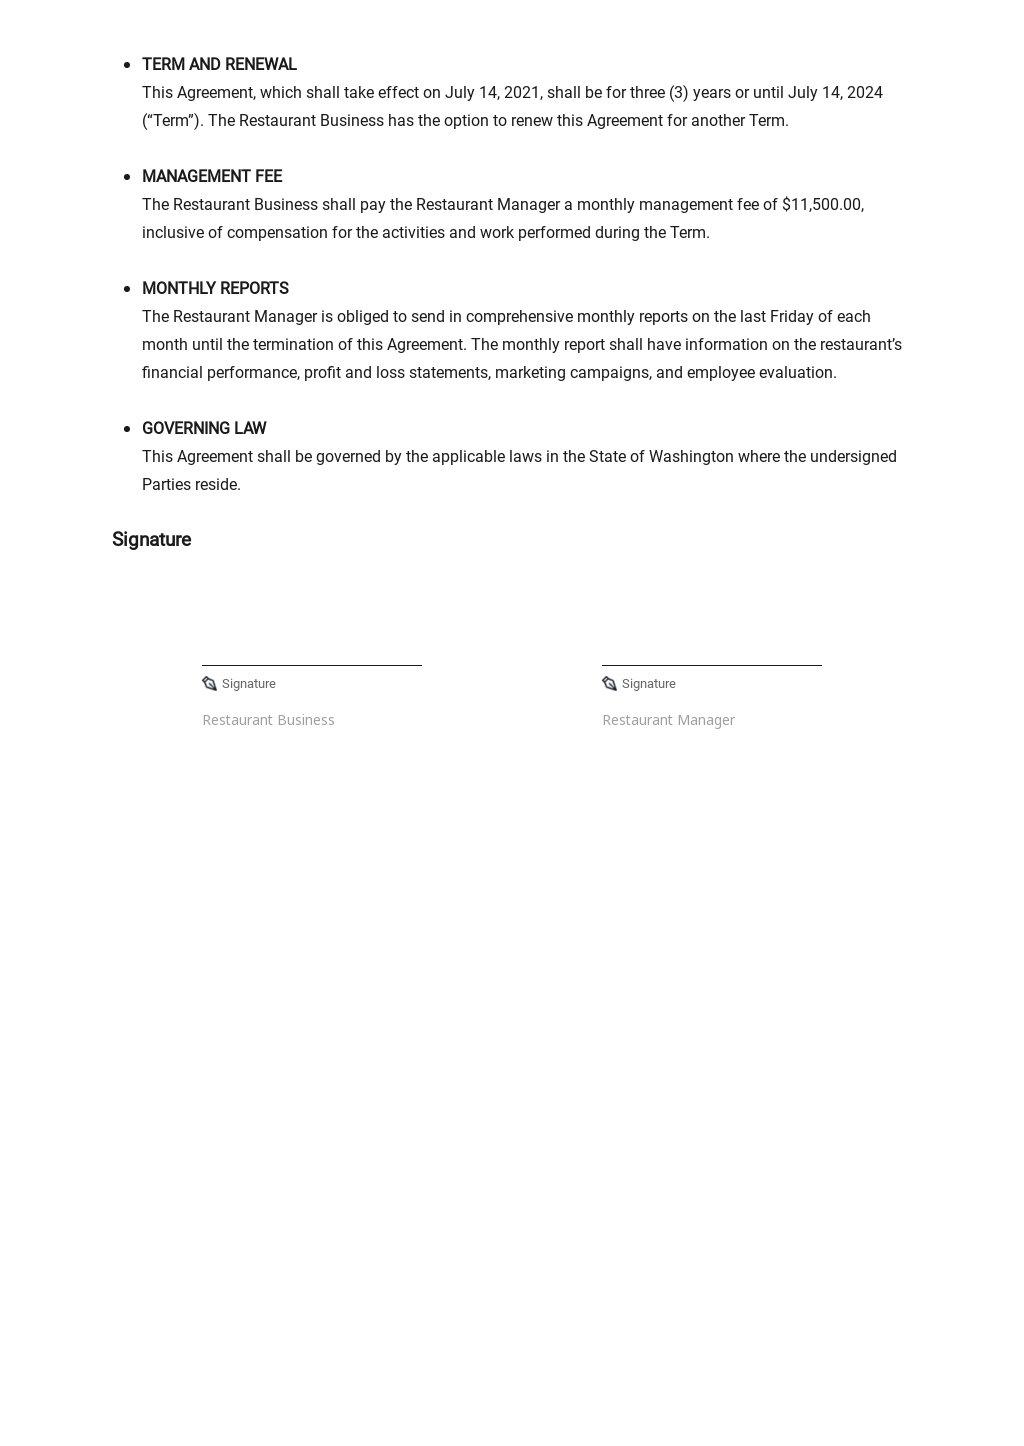 Restaurant Management Services Agreement Template 2.jpe